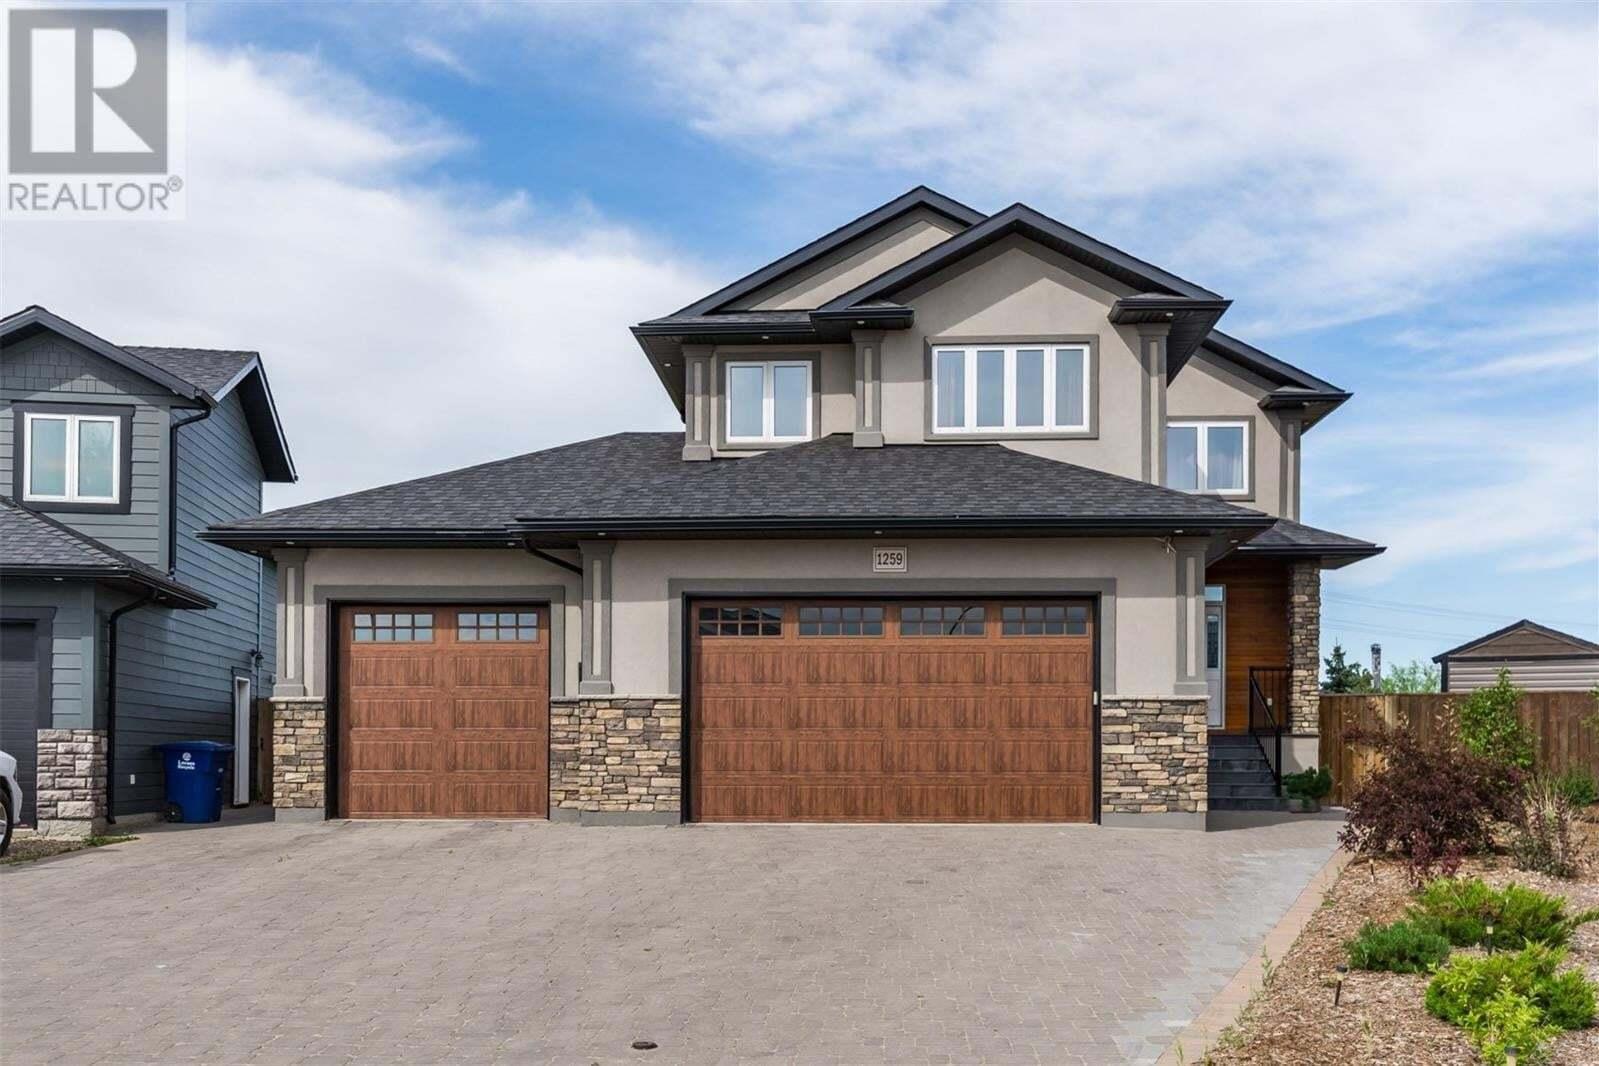 House for sale at 1259 Hargreaves Wy Saskatoon Saskatchewan - MLS: SK821280